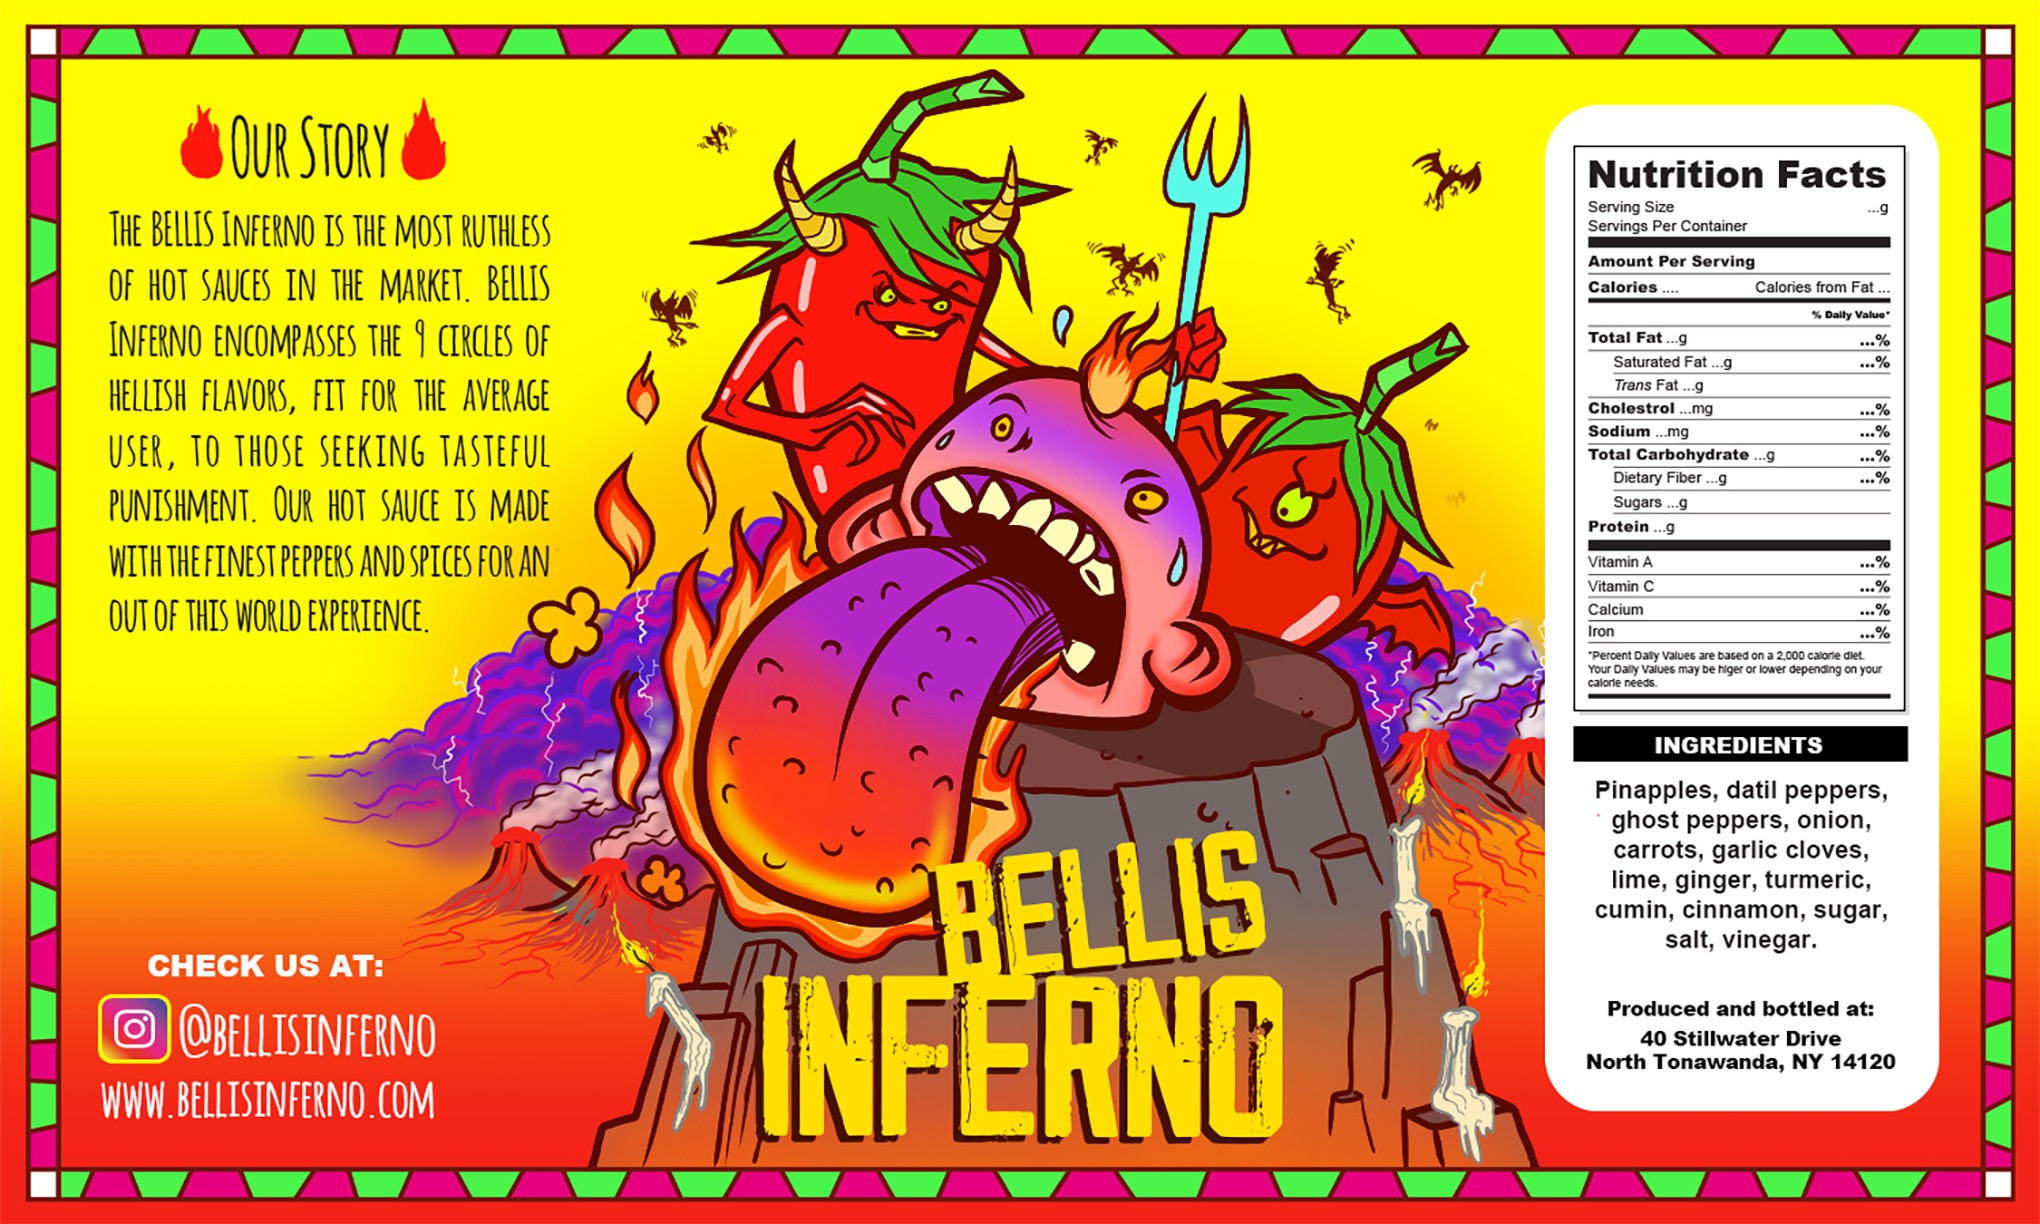 BELLIS Inferno